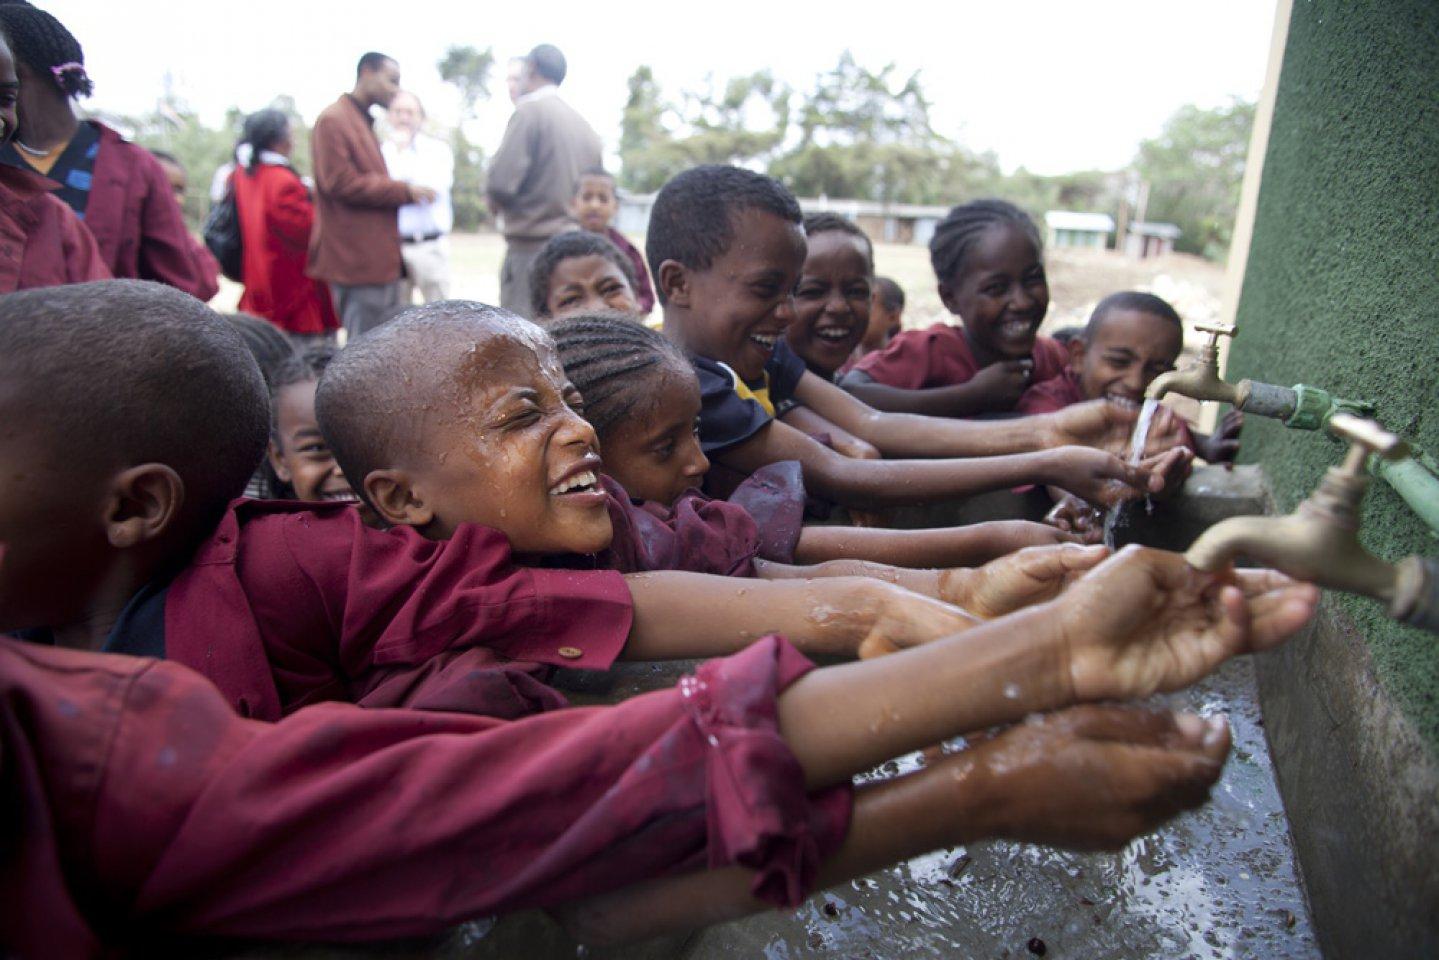 https://www.waterforlife.nl/files/visuals/_1920x960_fit_center-center_85_none/2012-ethiopia-bogaerts-vei-02-1000px_200401_131523.jpg